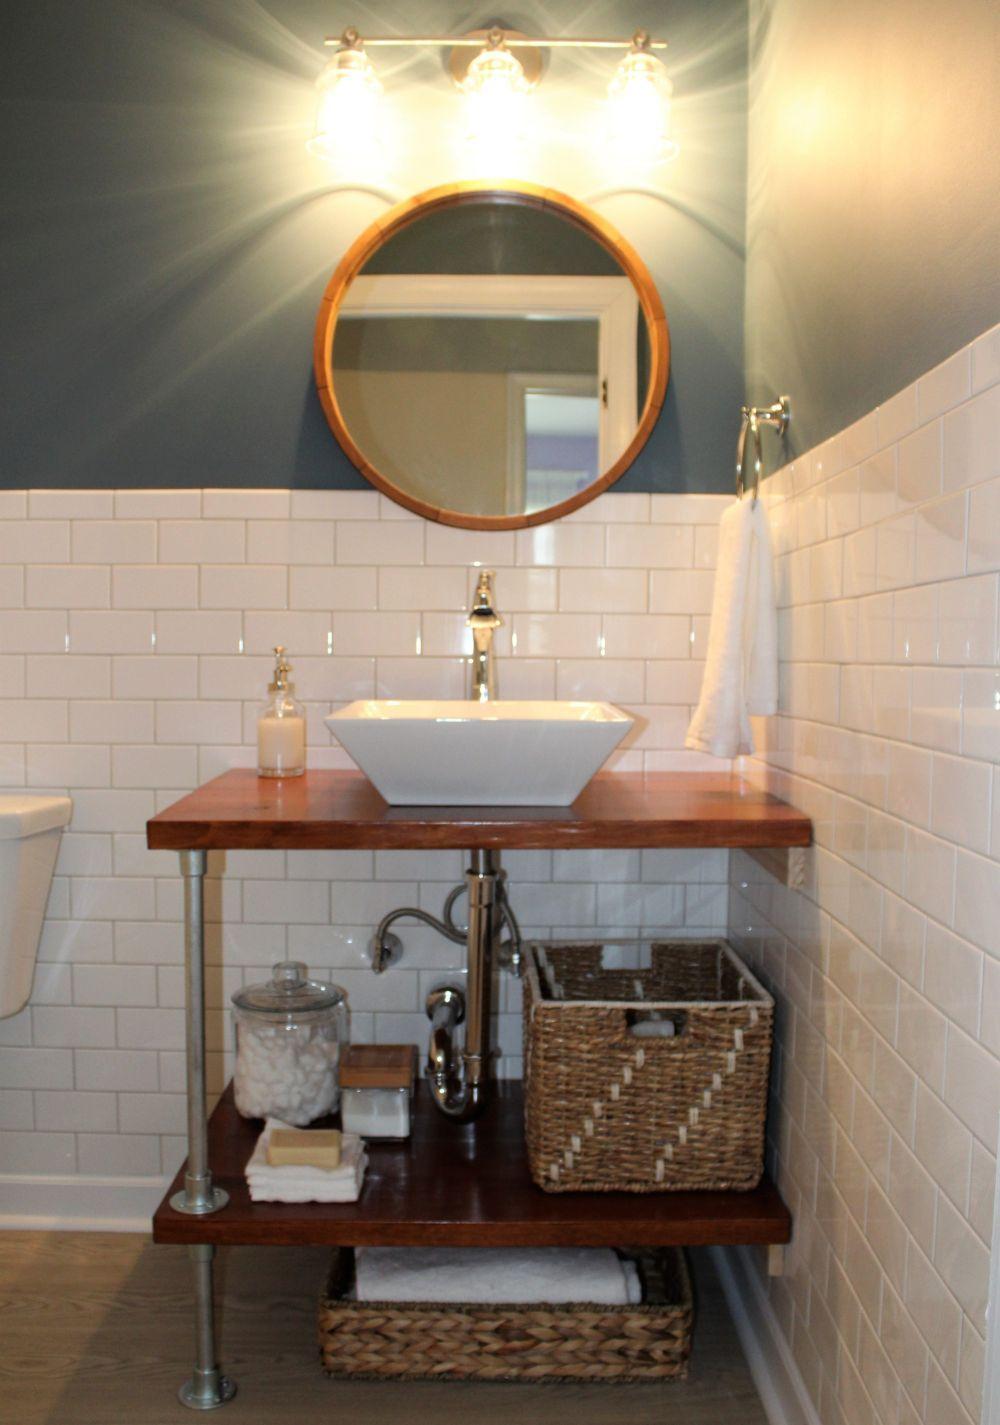 Diy Bathroom Vanity Ideas Perfect For Repurposers Rustic Bathroom Vanities Diy Bathroom Vanity Small Bathroom Vanities